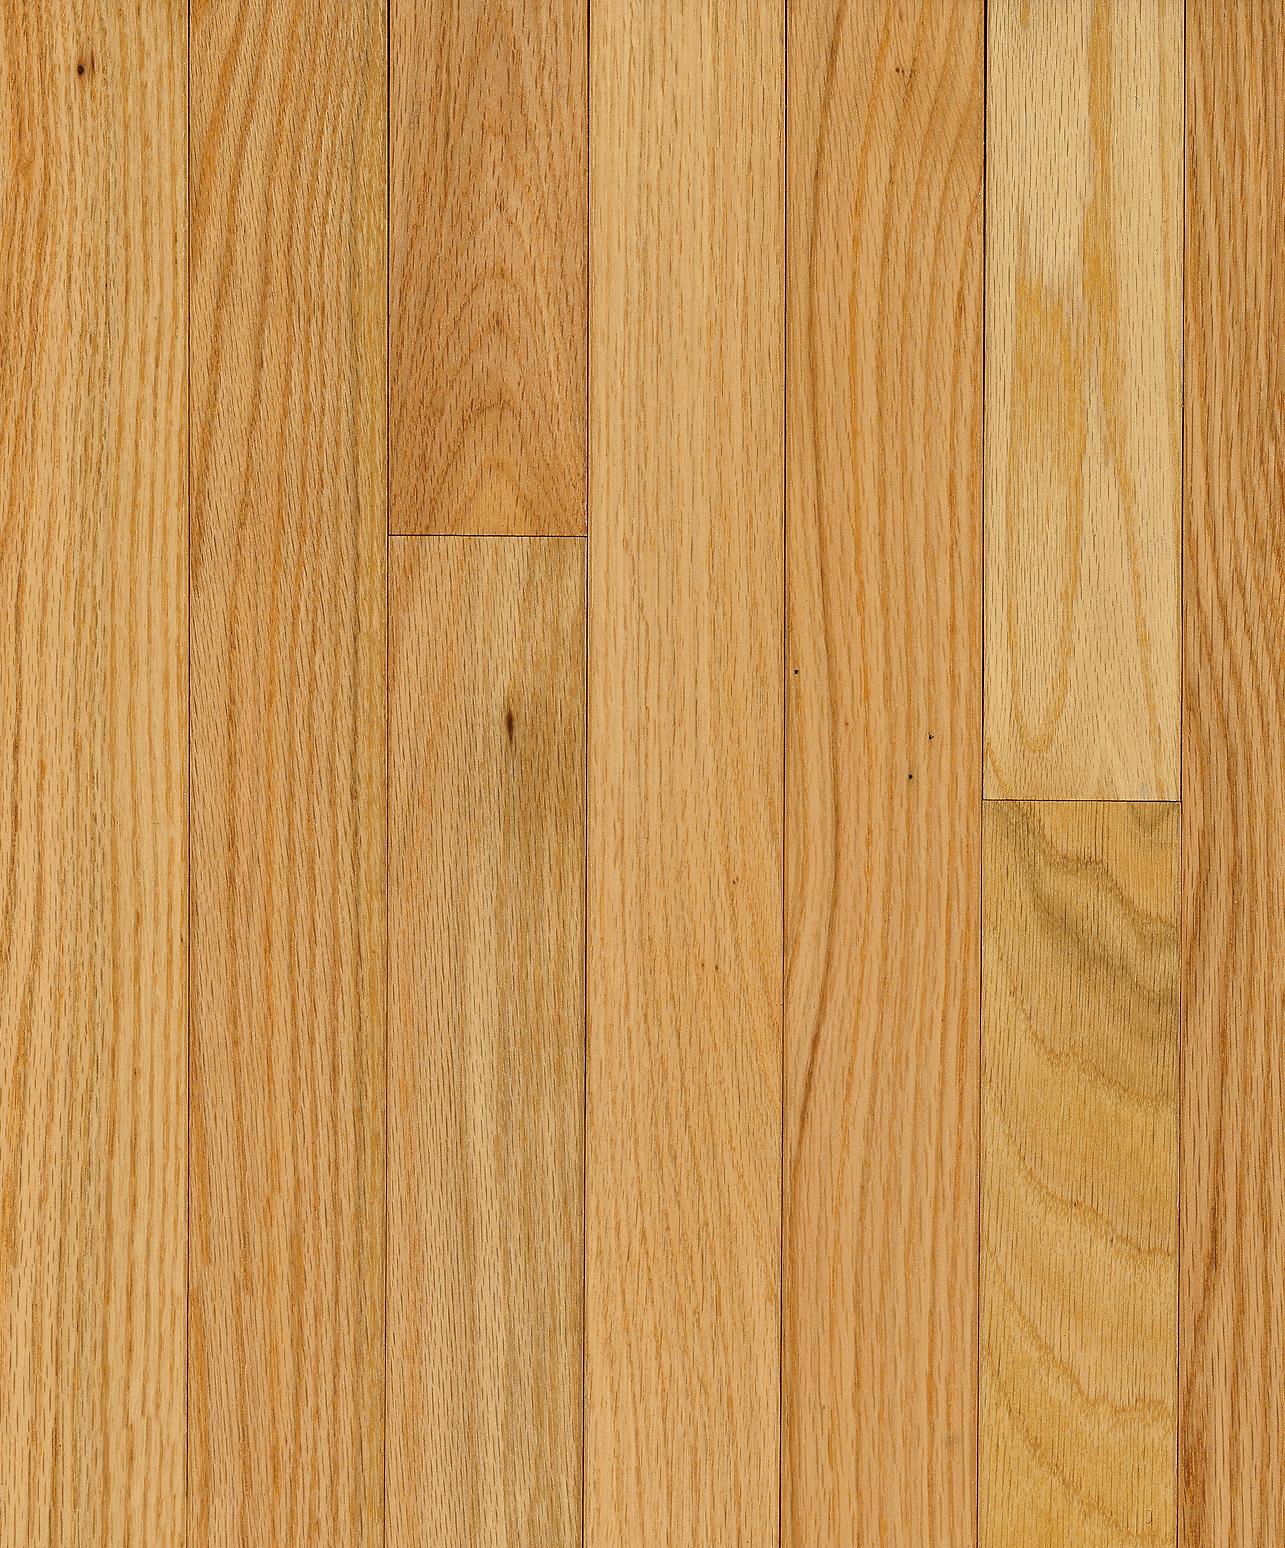 Solid Hardwood Manchester Strip Plank C210 Bruce